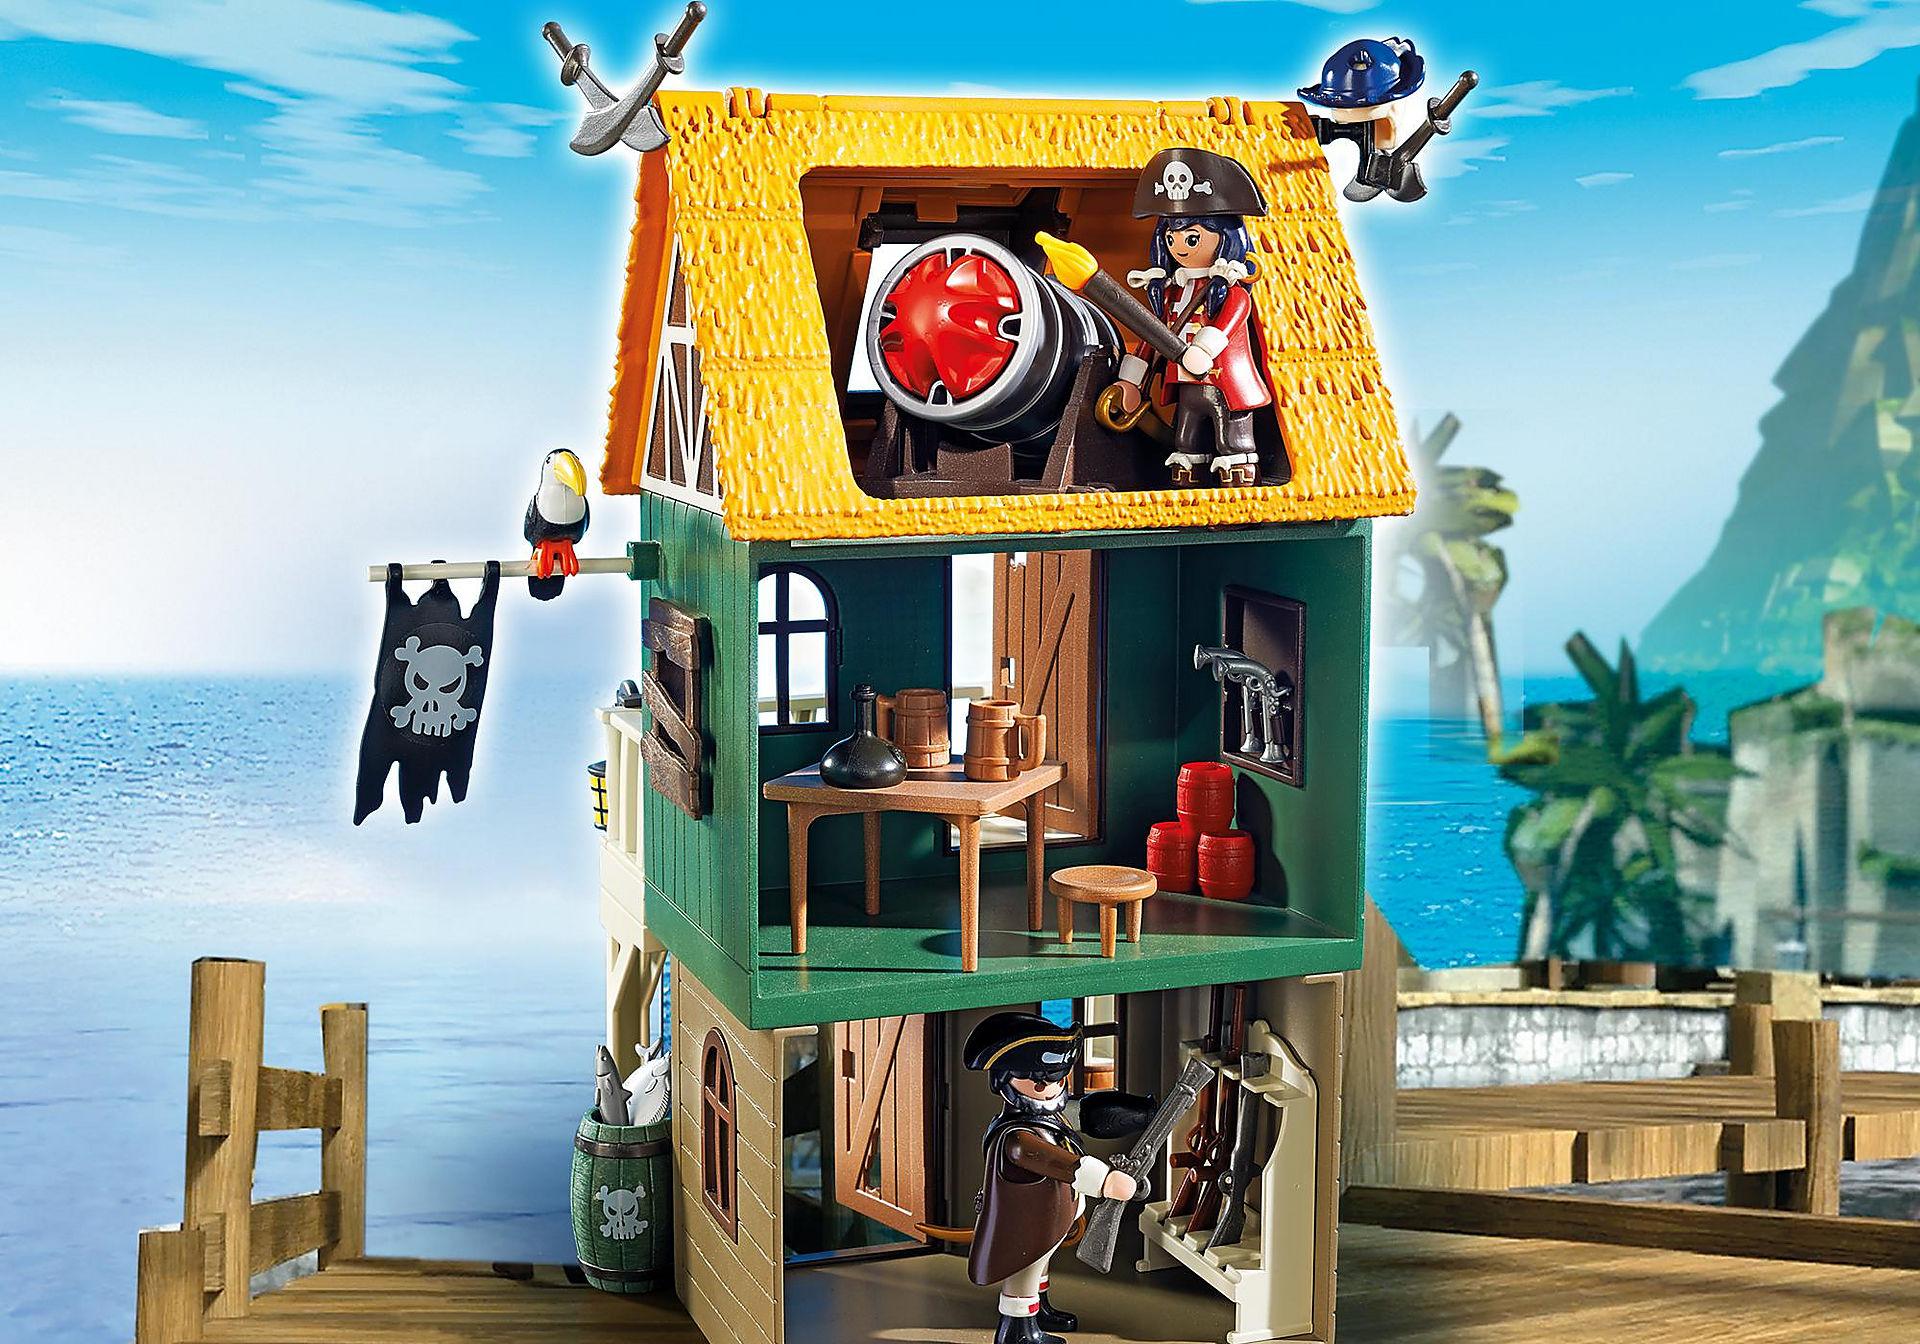 http://media.playmobil.com/i/playmobil/4796_product_extra2/Замаскированный Пиратский Форт с Руби